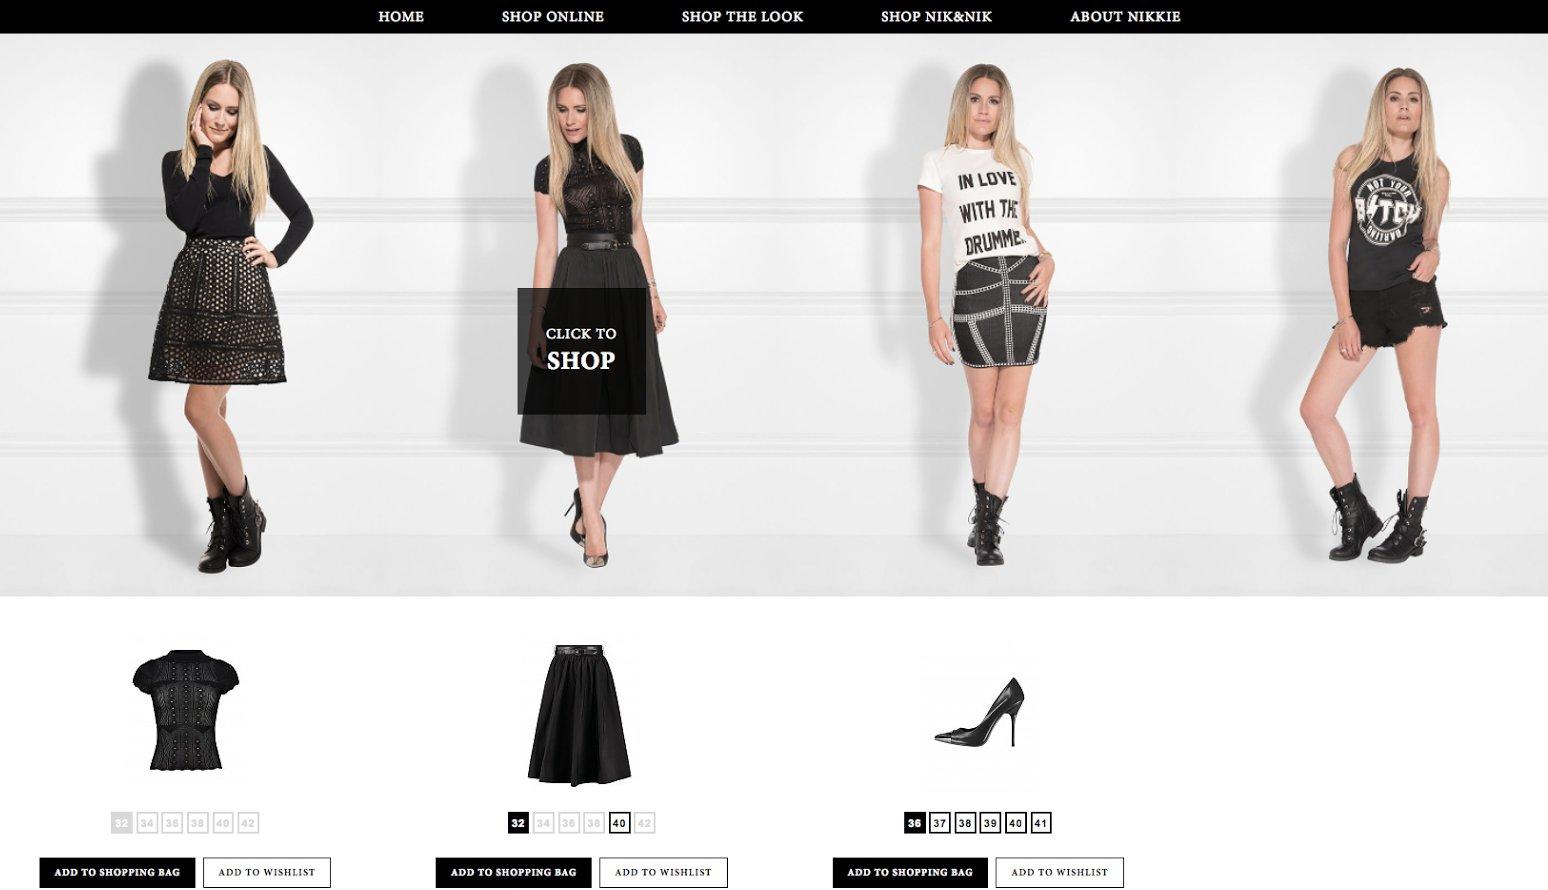 De lookbook pagina van fashion webshop NIKKIE